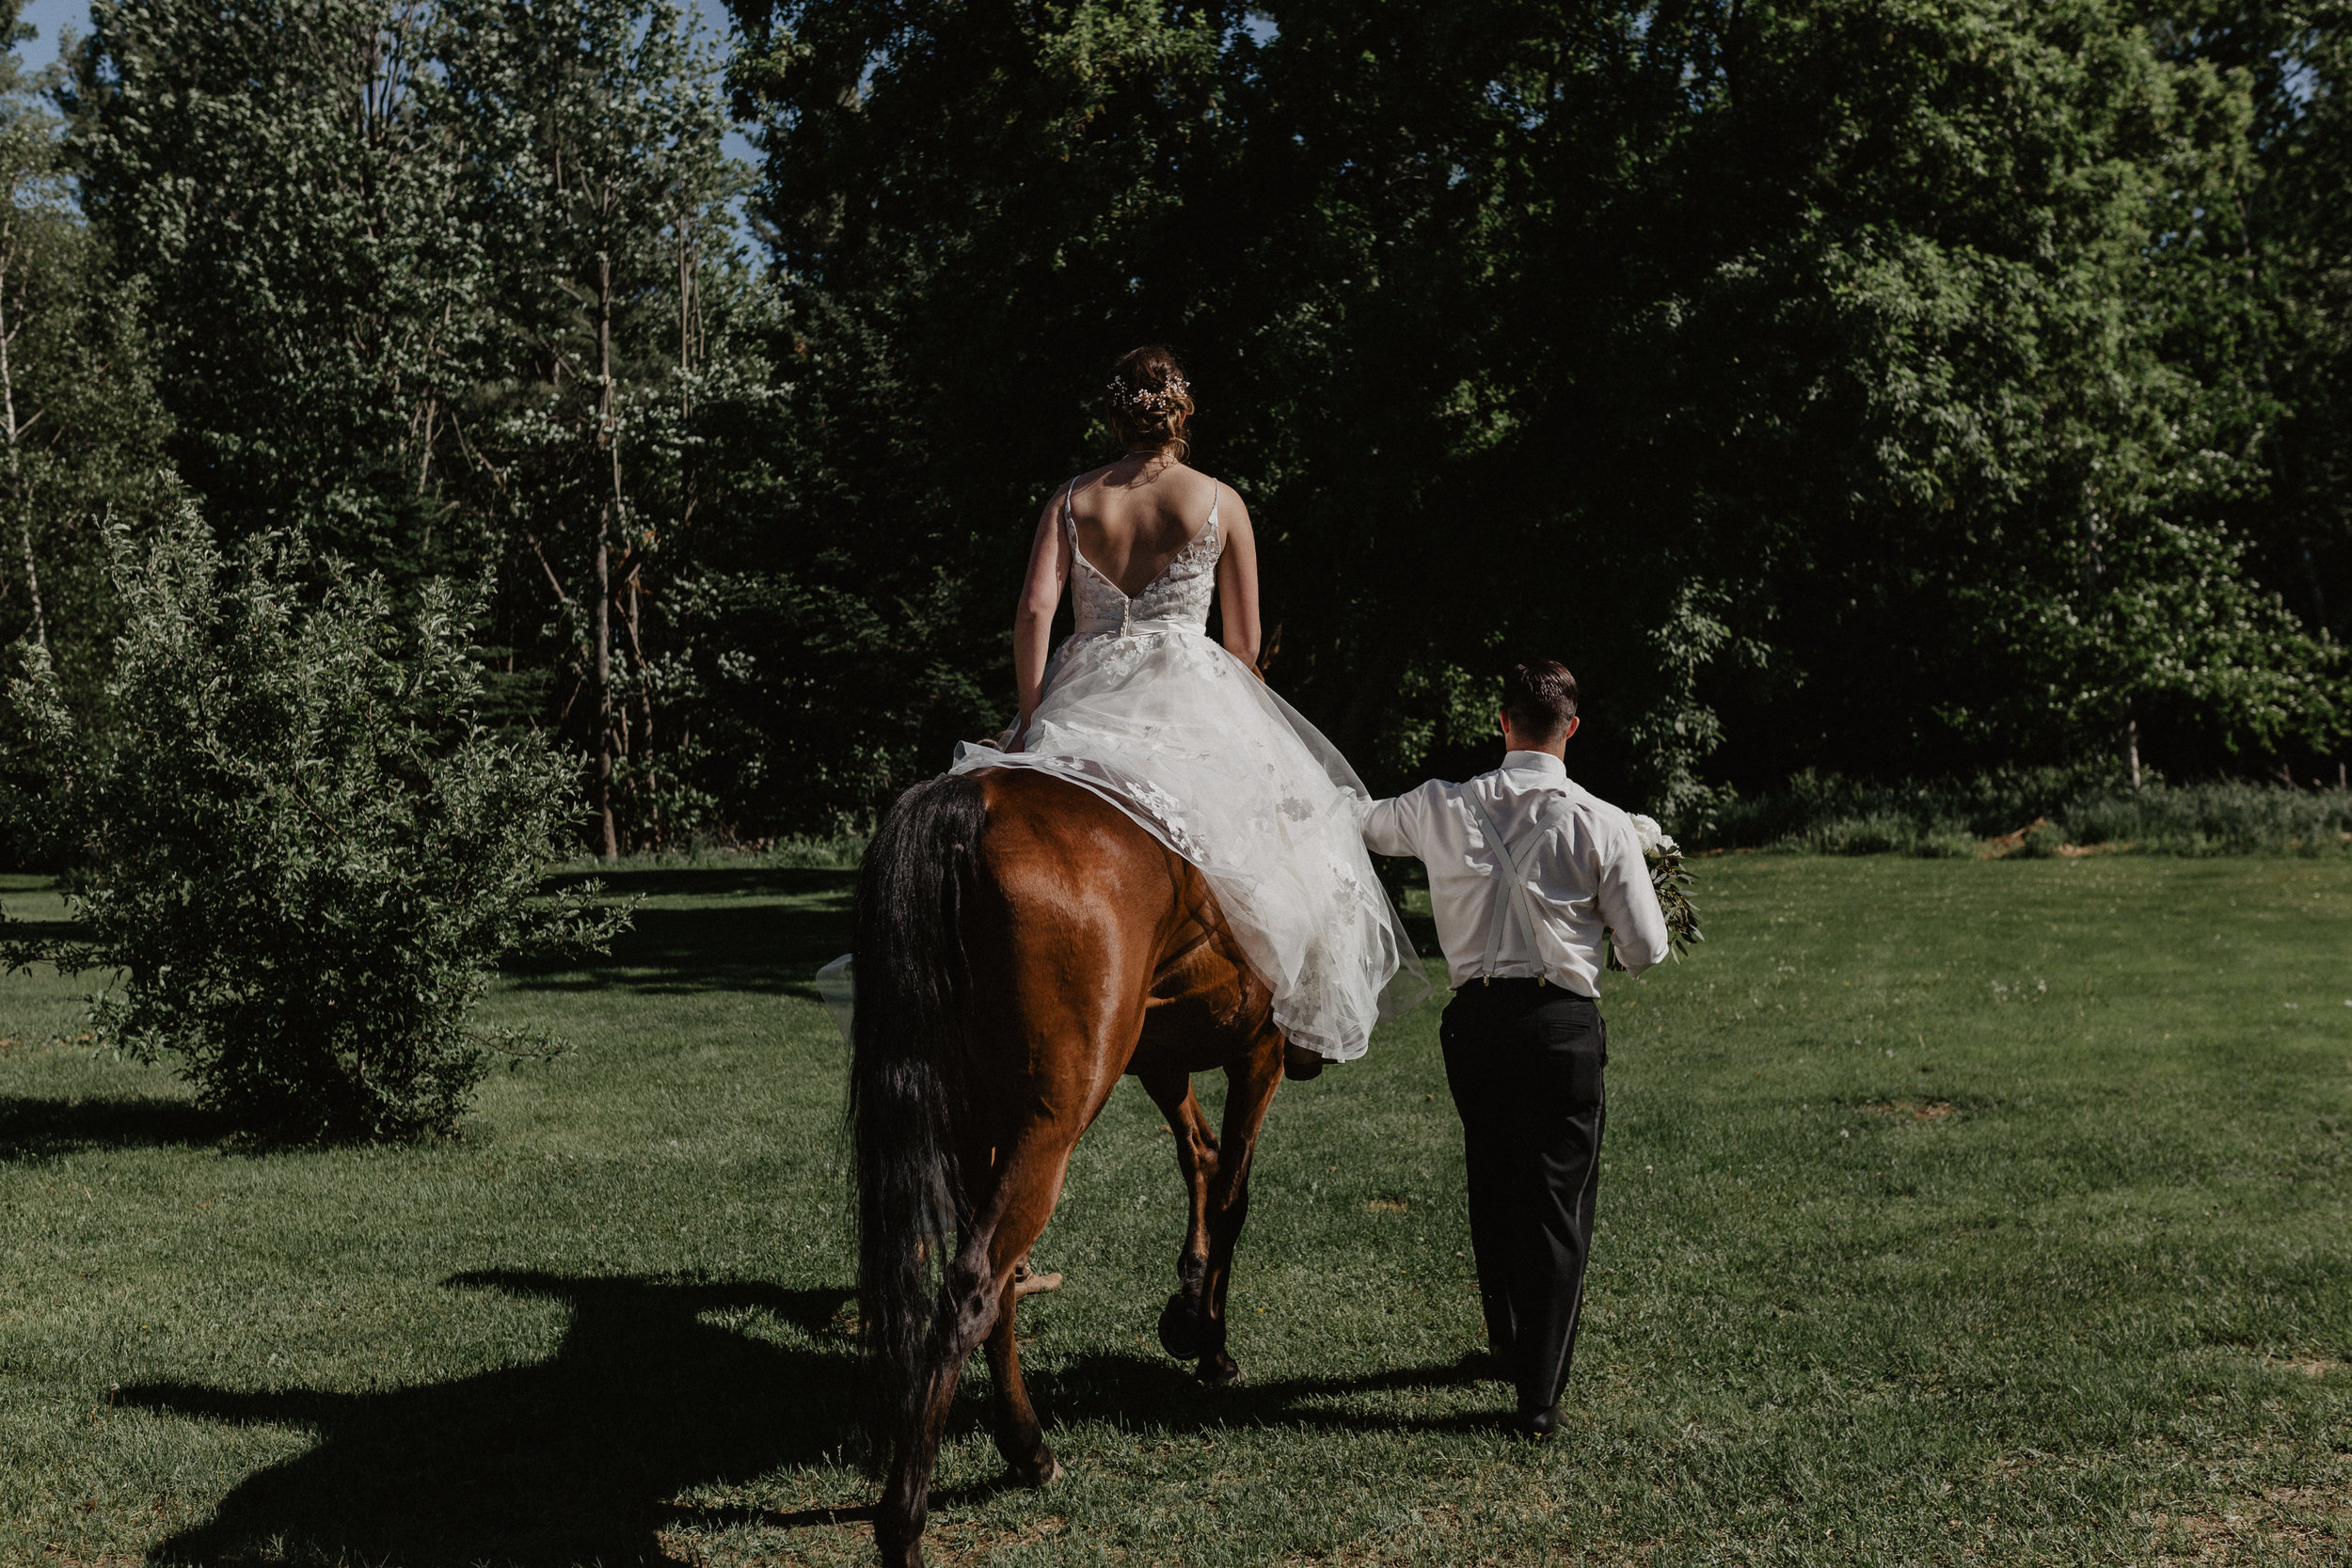 upstate_ny_wedding-67.jpg